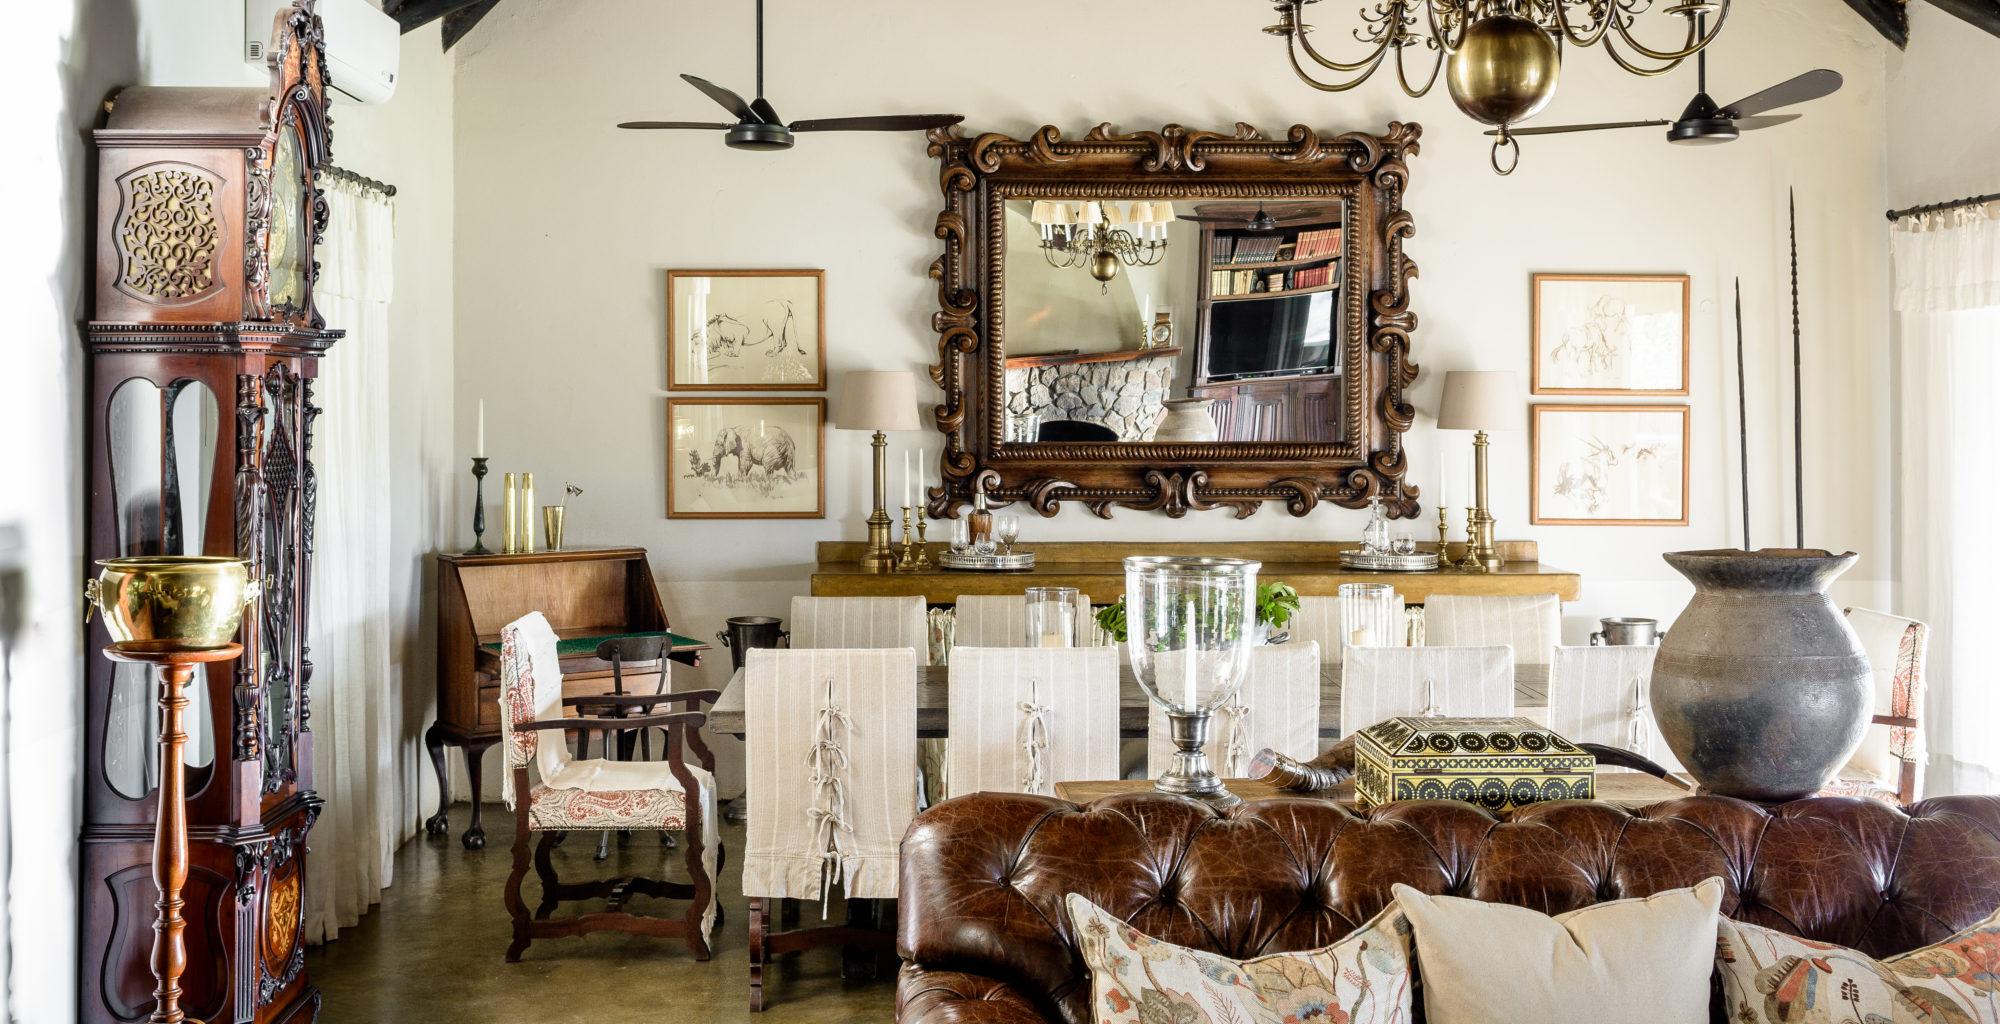 South-Africa-Singita-Castleton-Dining